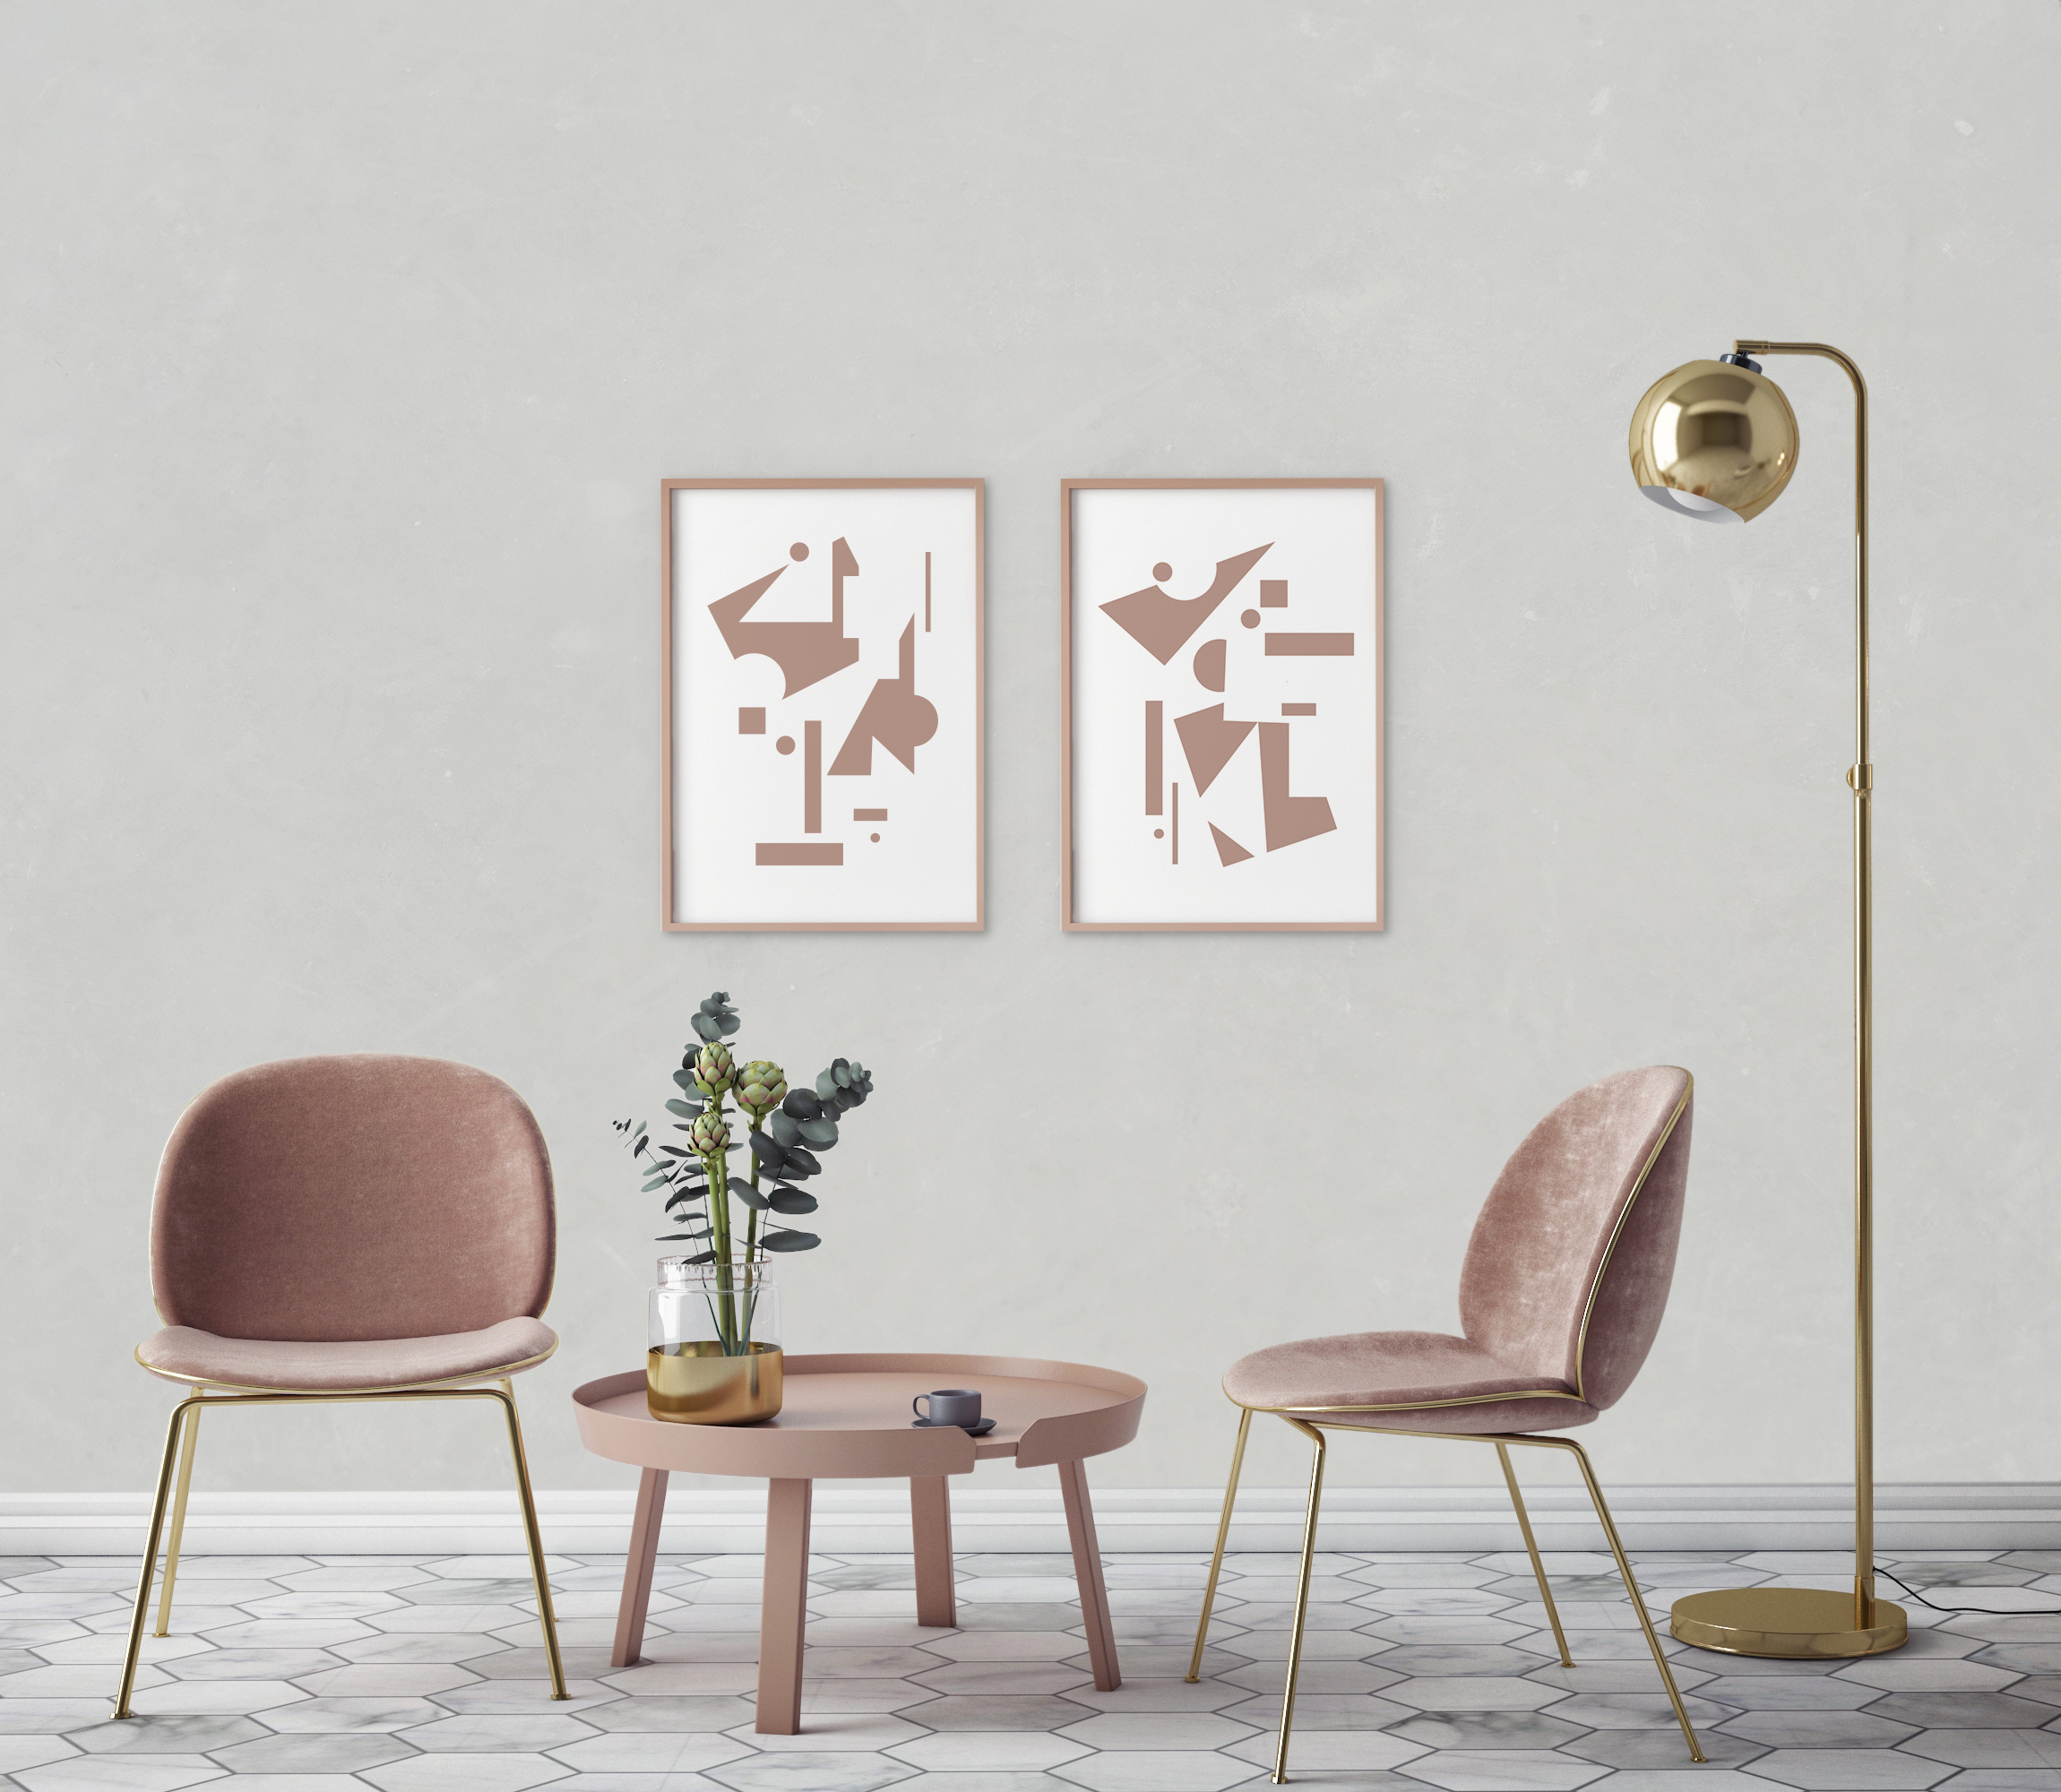 vision-glory-lifestyle-pinkchairs.jpg